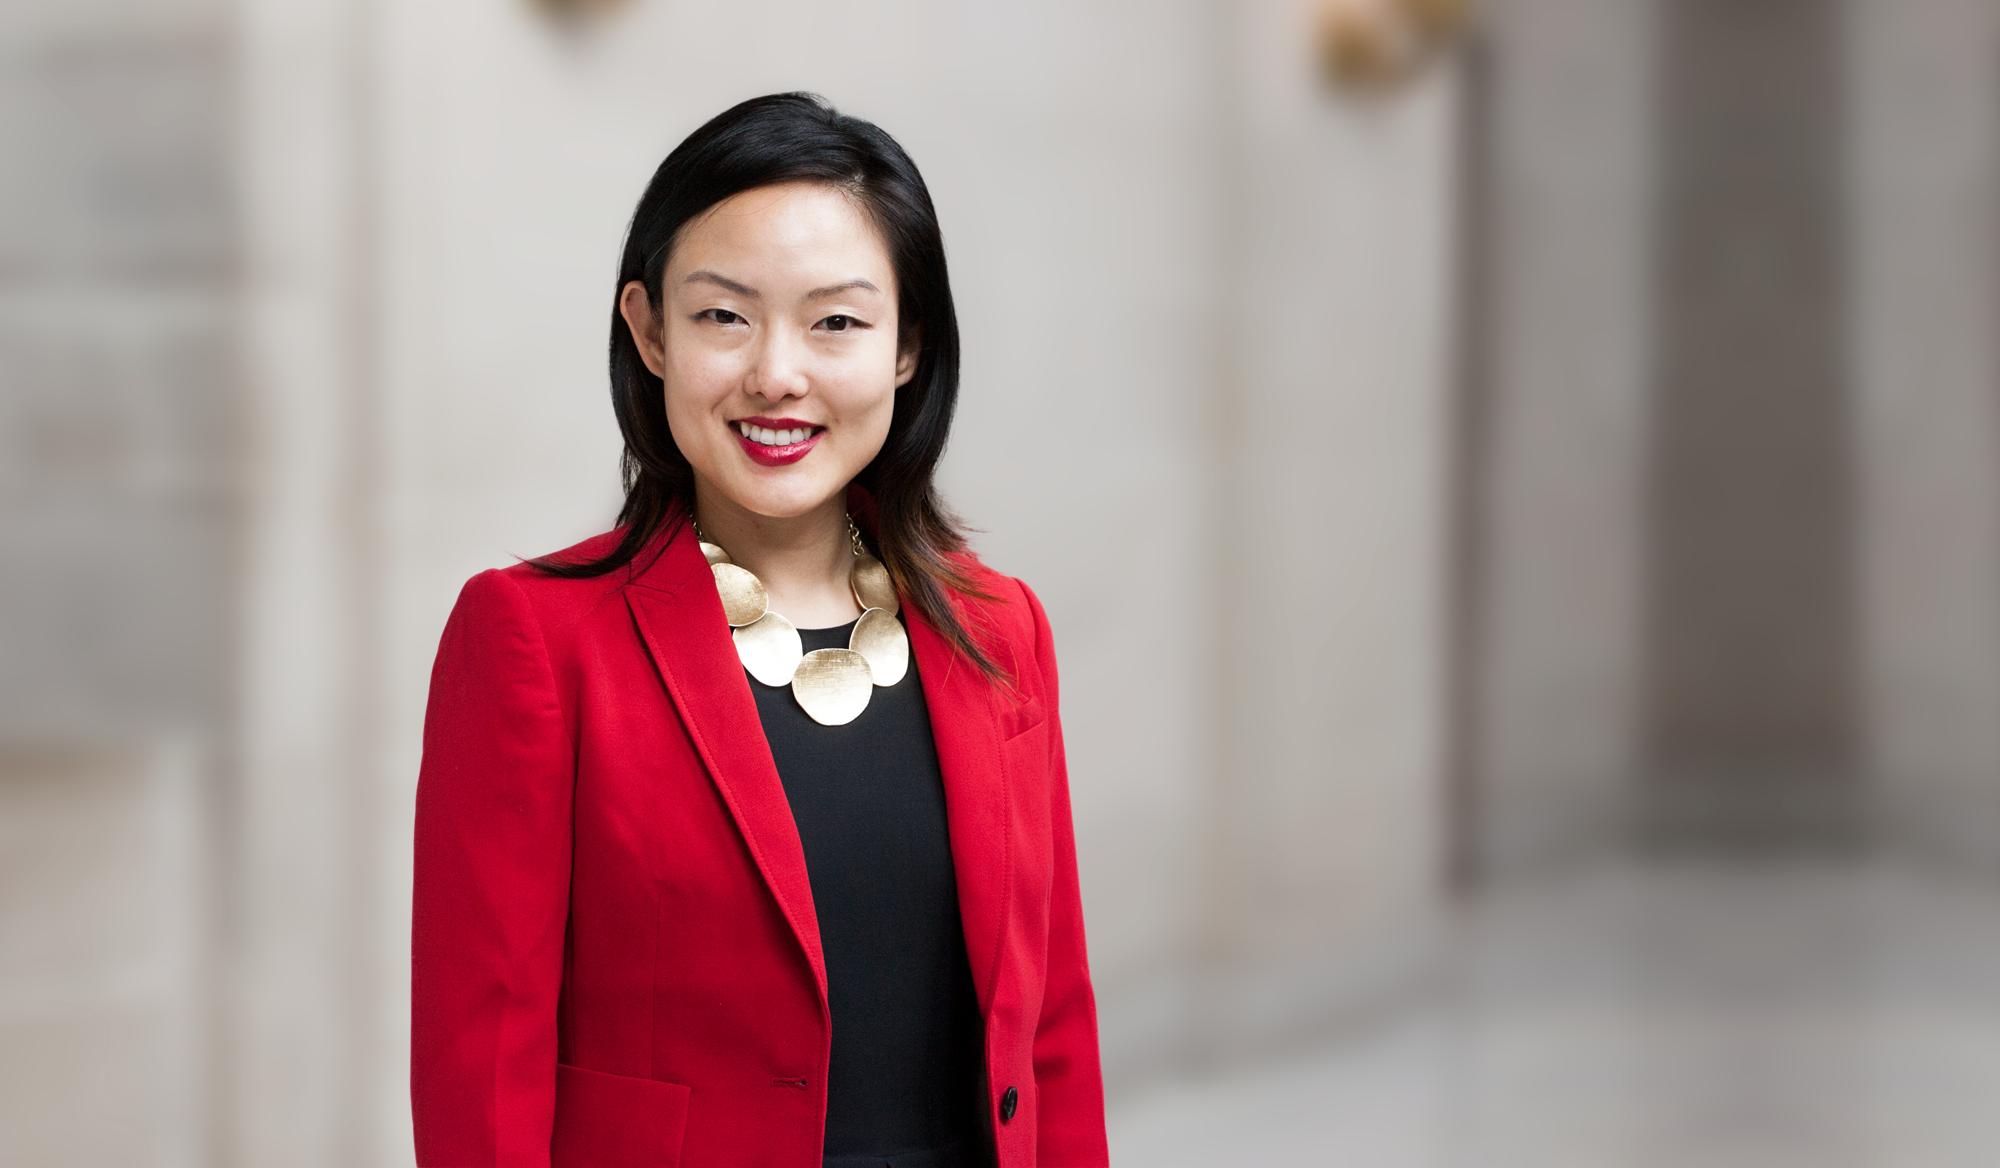 Jane Kim for State Senate